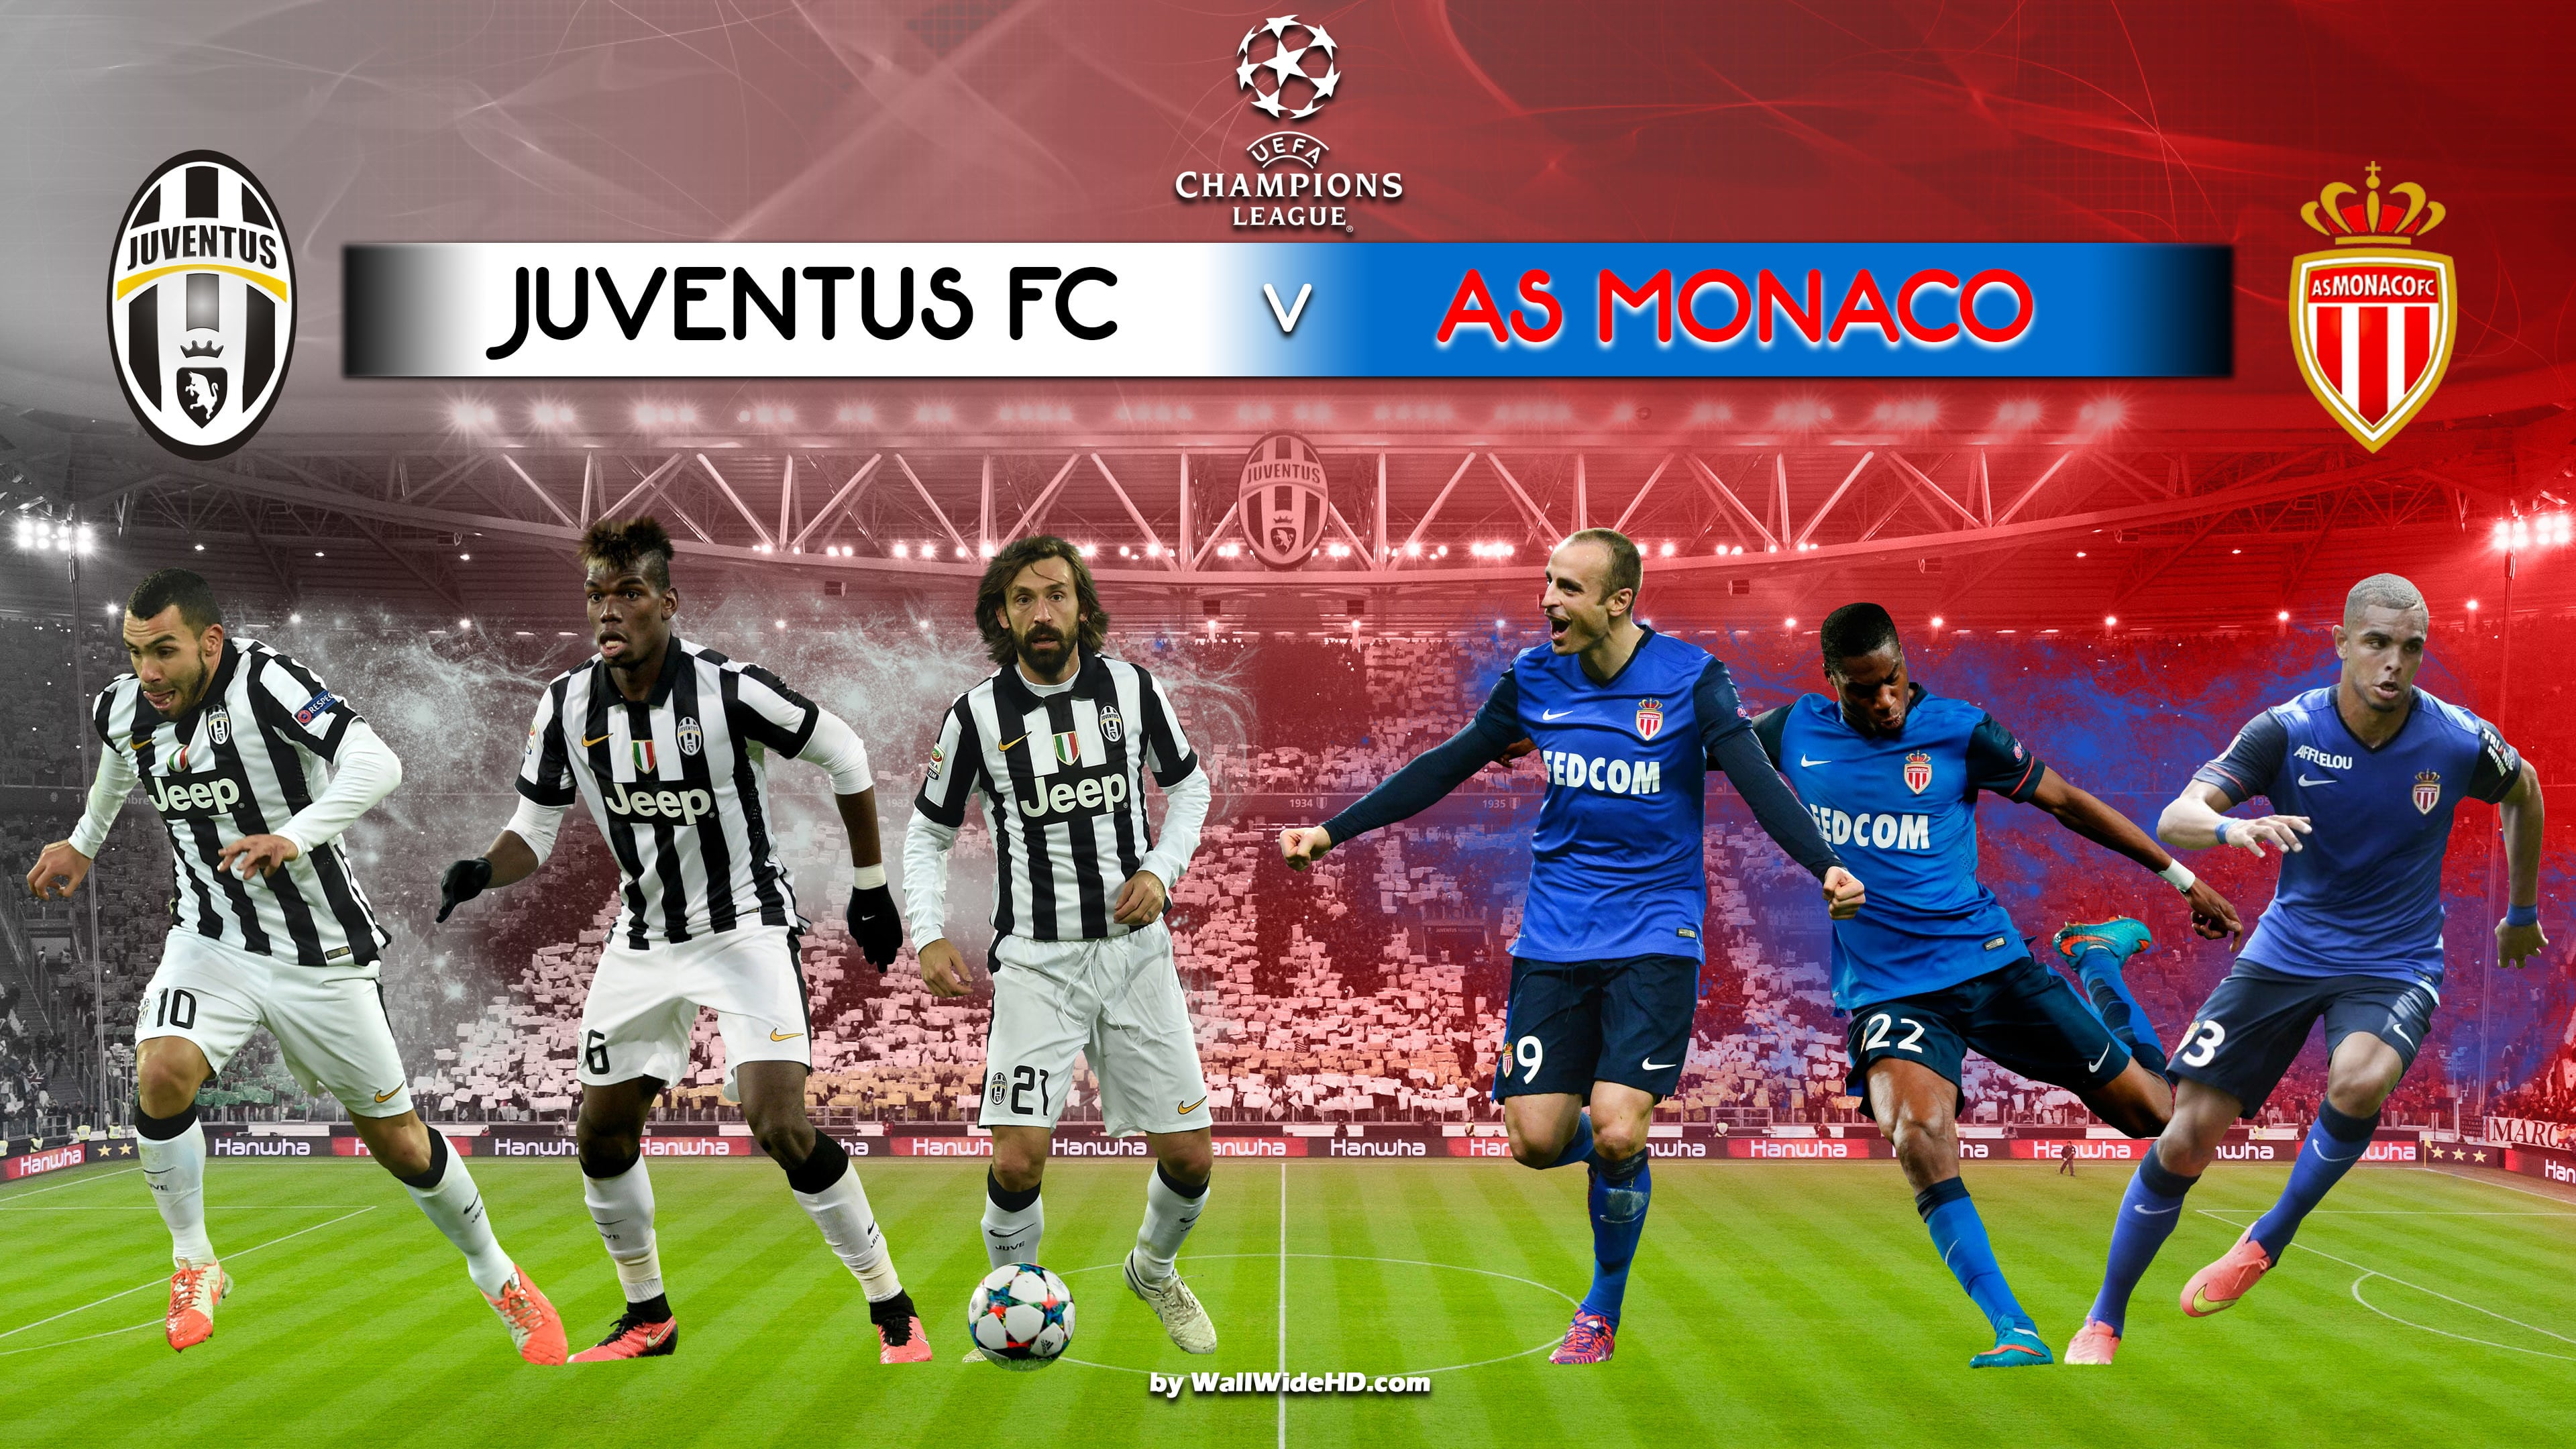 Juventus Monaco Maçı hangi kanalda? 14 Nisan 2015